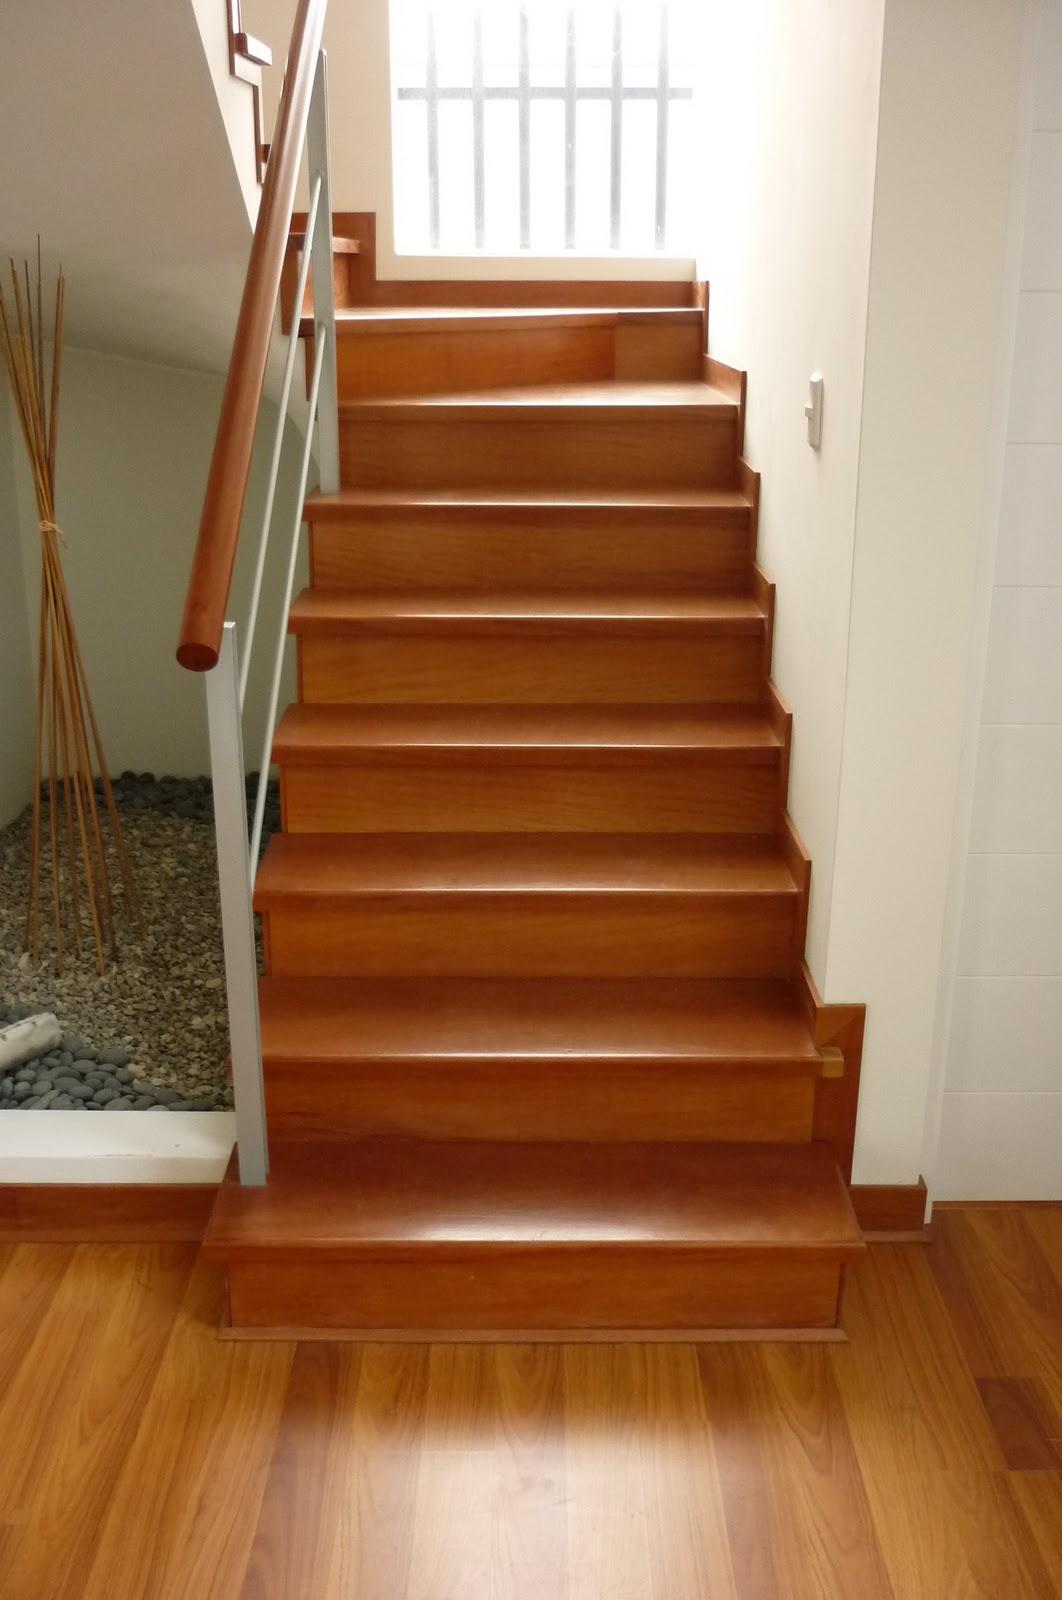 Madera para escalones perfect escaleras with madera para - Escaleras de casas ...